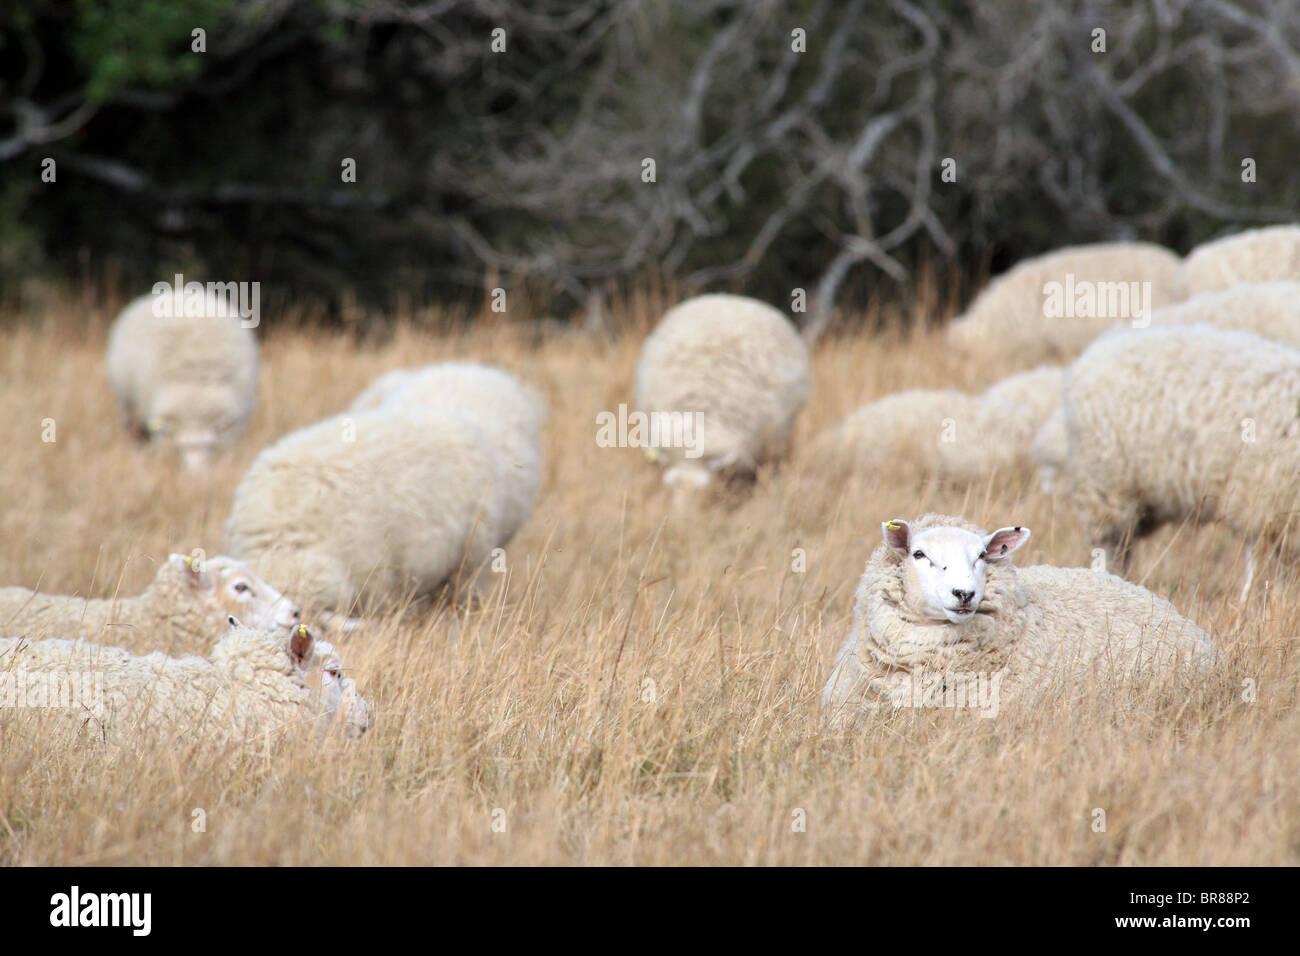 Flock of sheep with full fleece of wool on dry farmland. Moeraki, Otago, South Island, New Zealand, Australasia - Stock Image